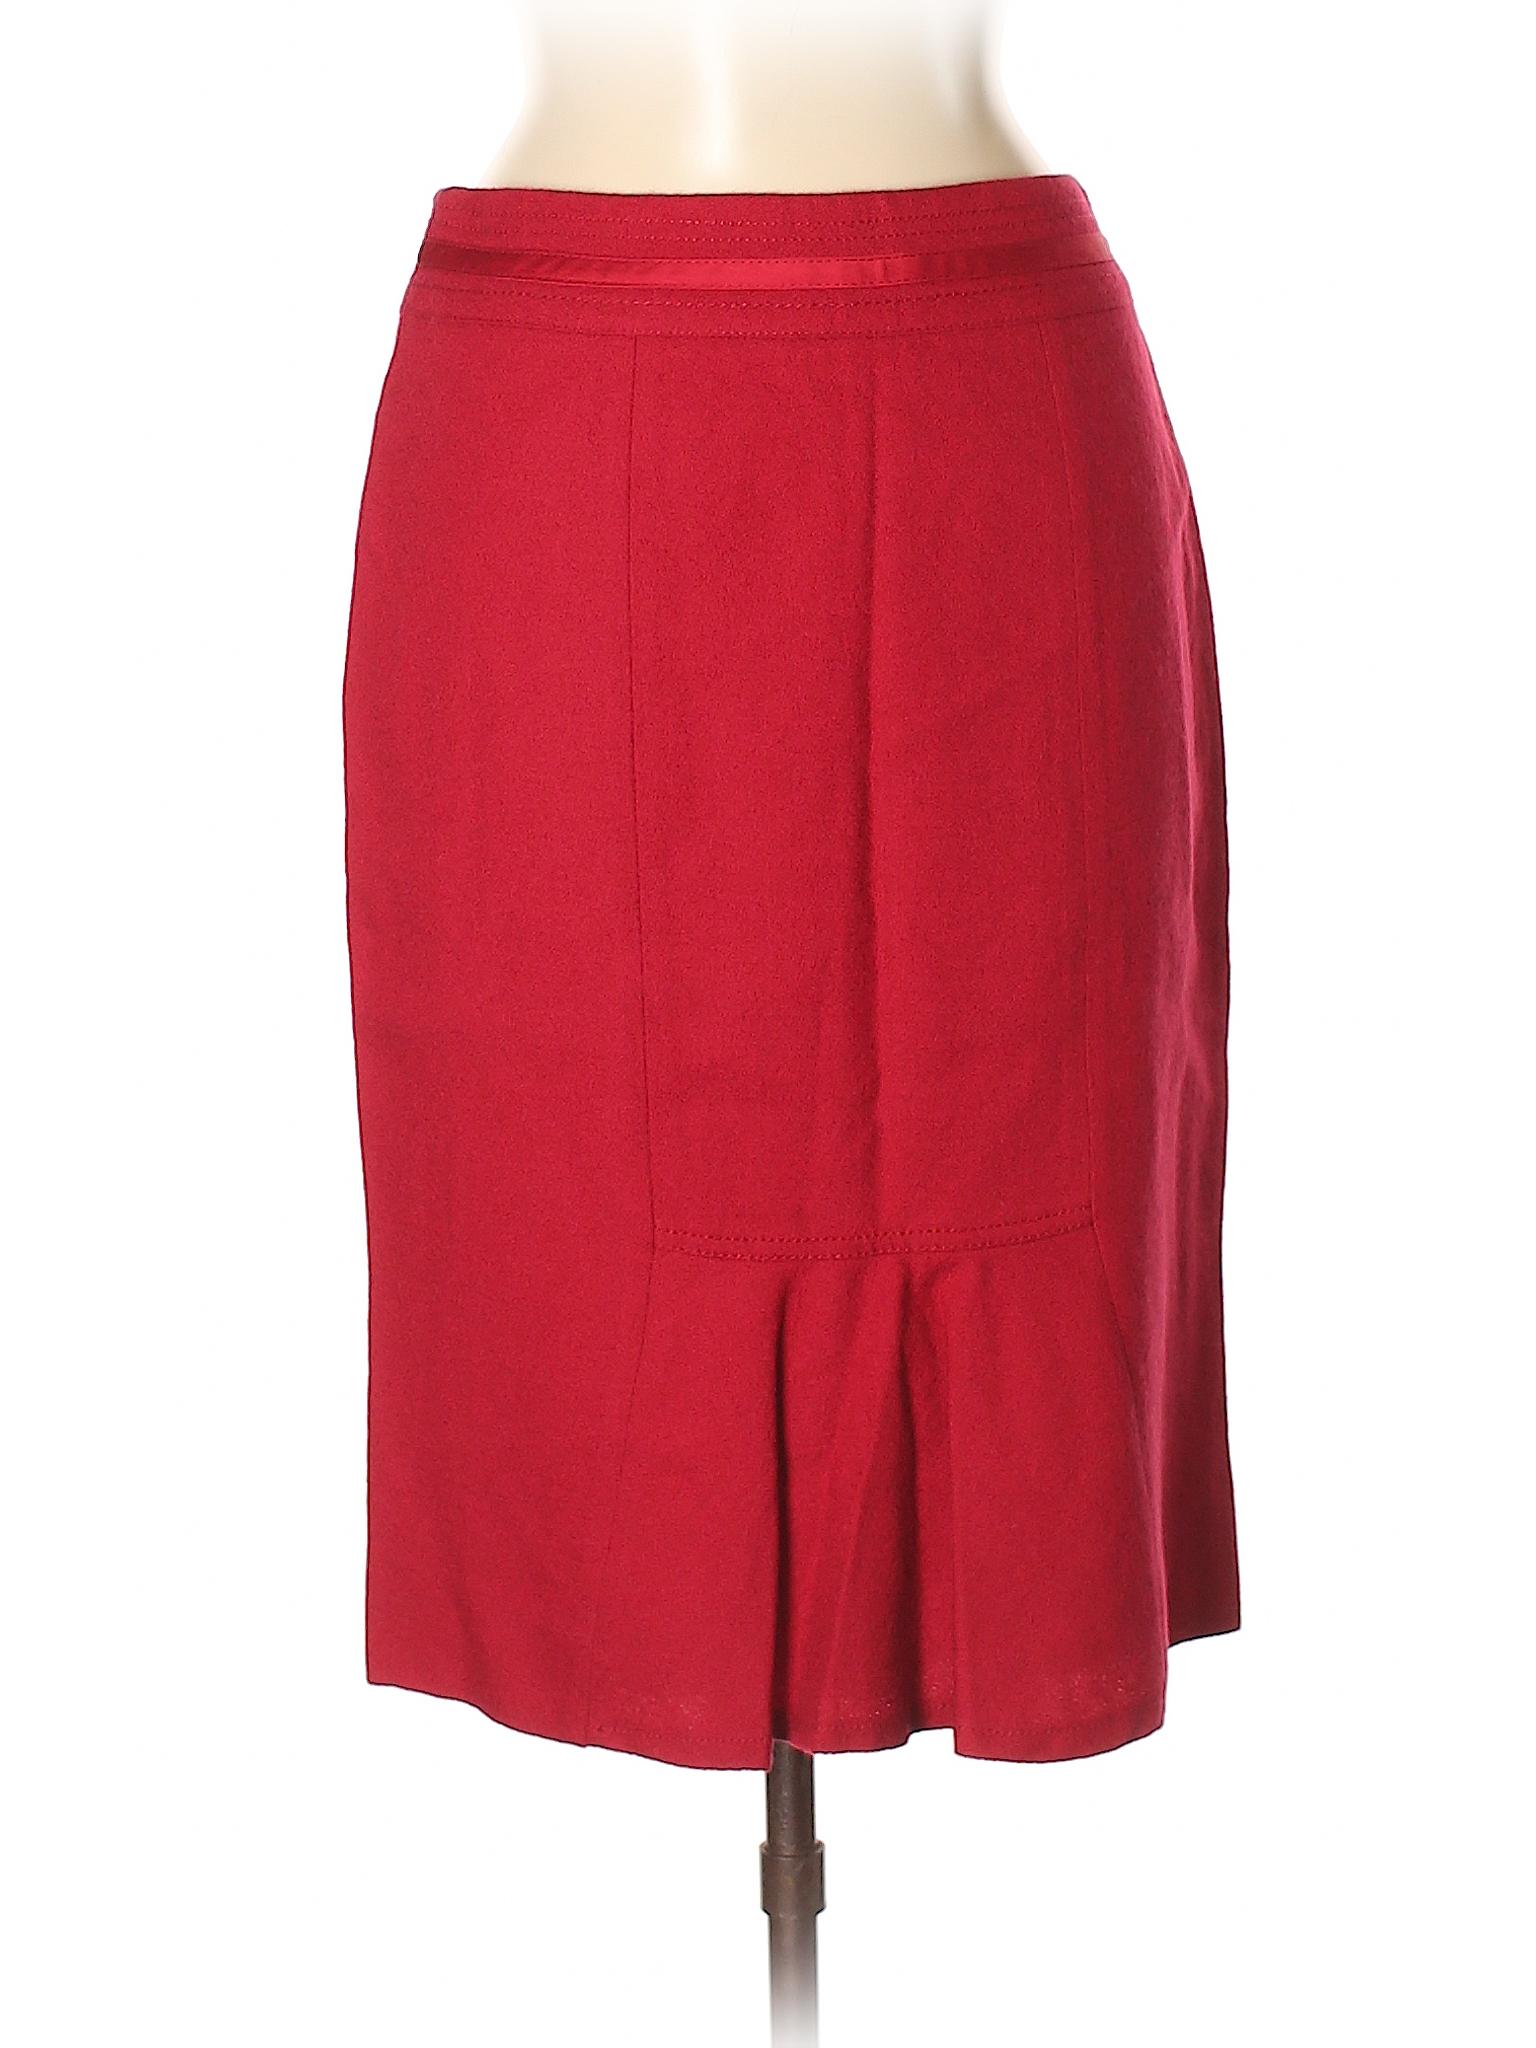 leisure Skirt House White Black Market Boutique Casual d78Yvxn71